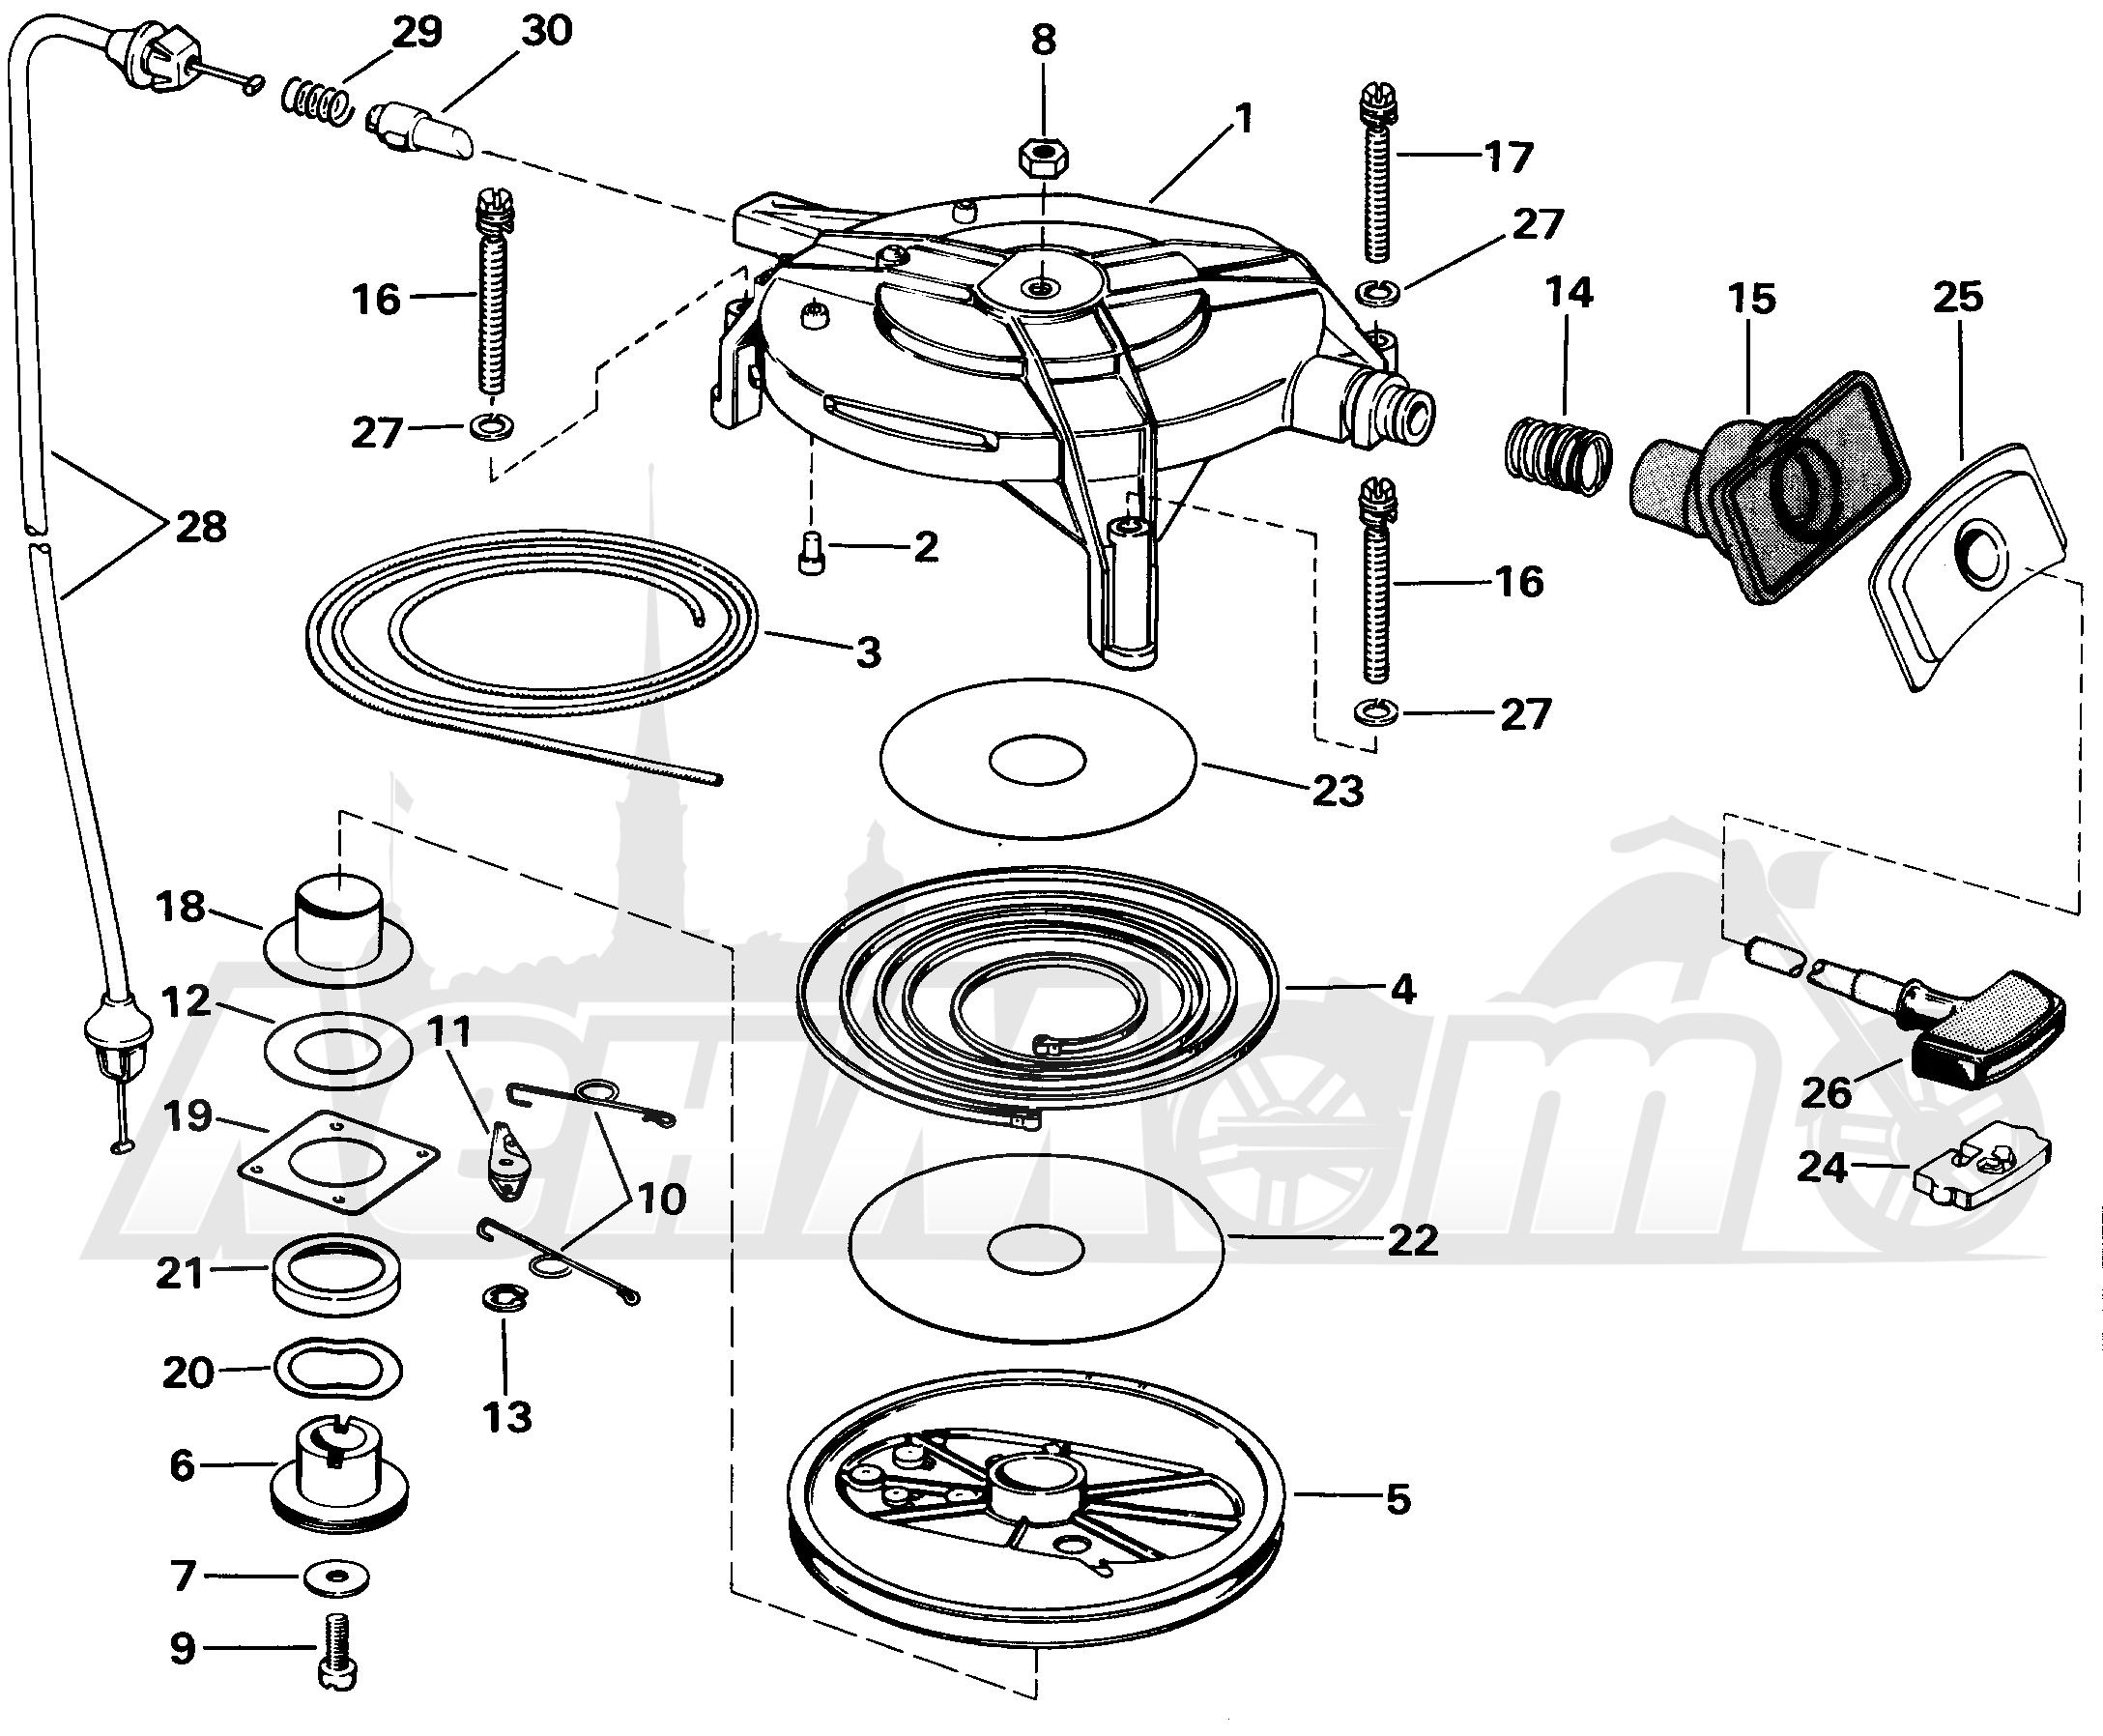 сборка ручного стартера лодочного мотора